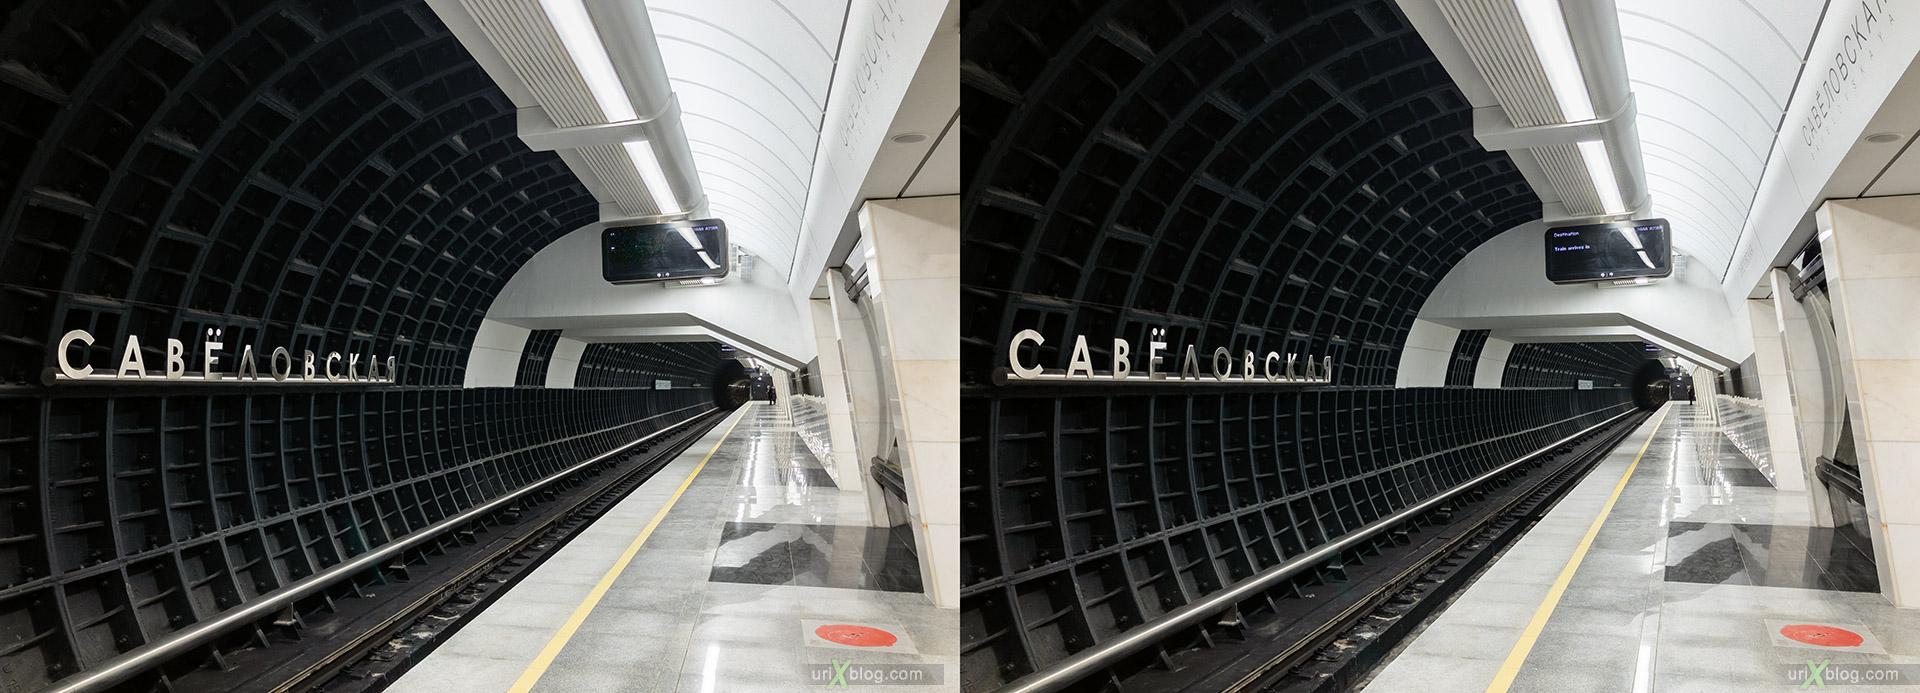 Savyolovskaya BKL, metro station, Bolshaya Koltsevaya line, Moscow, Russia, 3D, stereo pair, cross-eyed, crossview, cross view stereo pair, stereoscopic